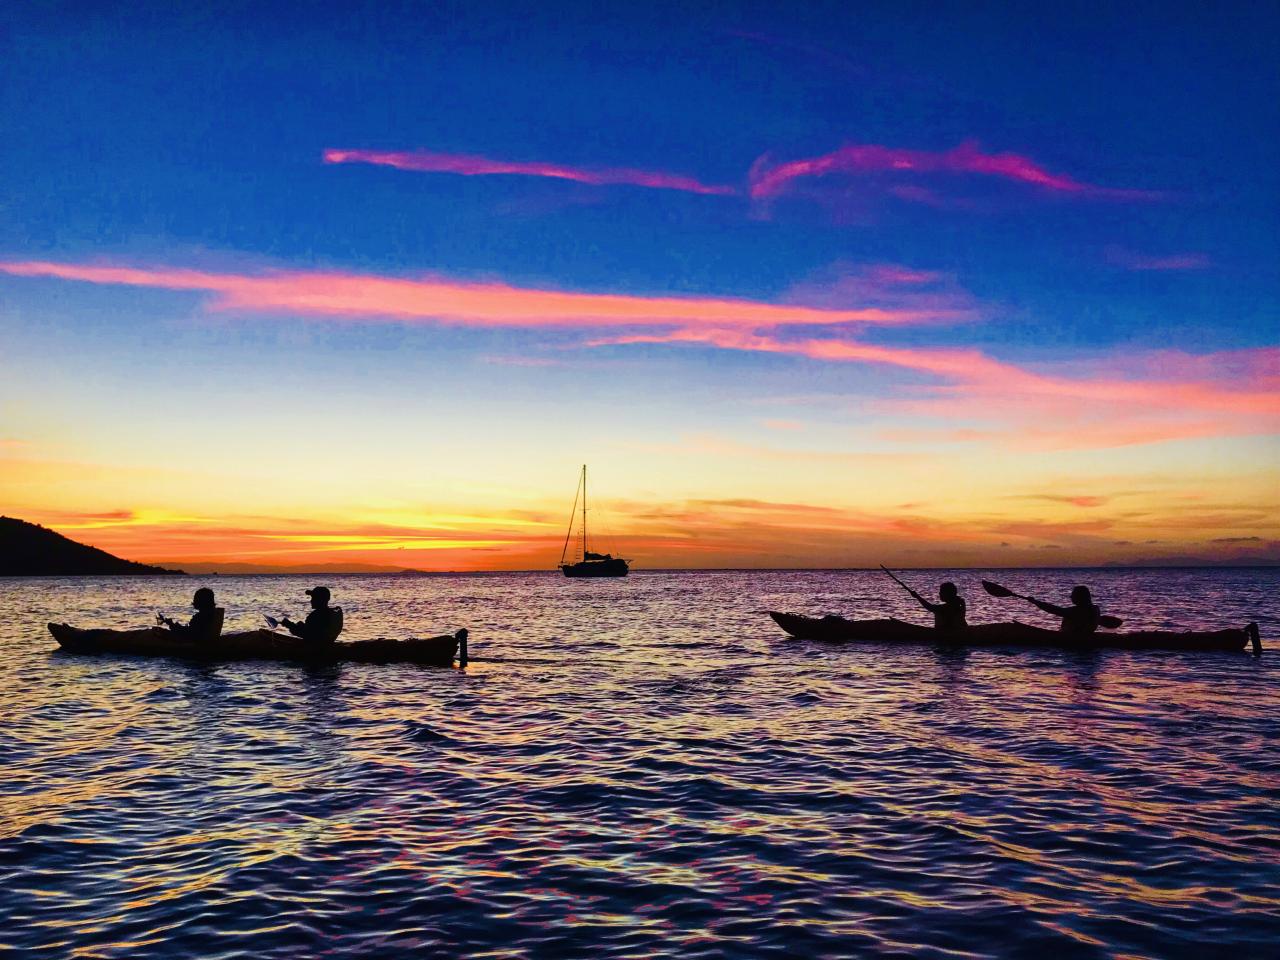 Sunset Silhouette by Craig Chrichton